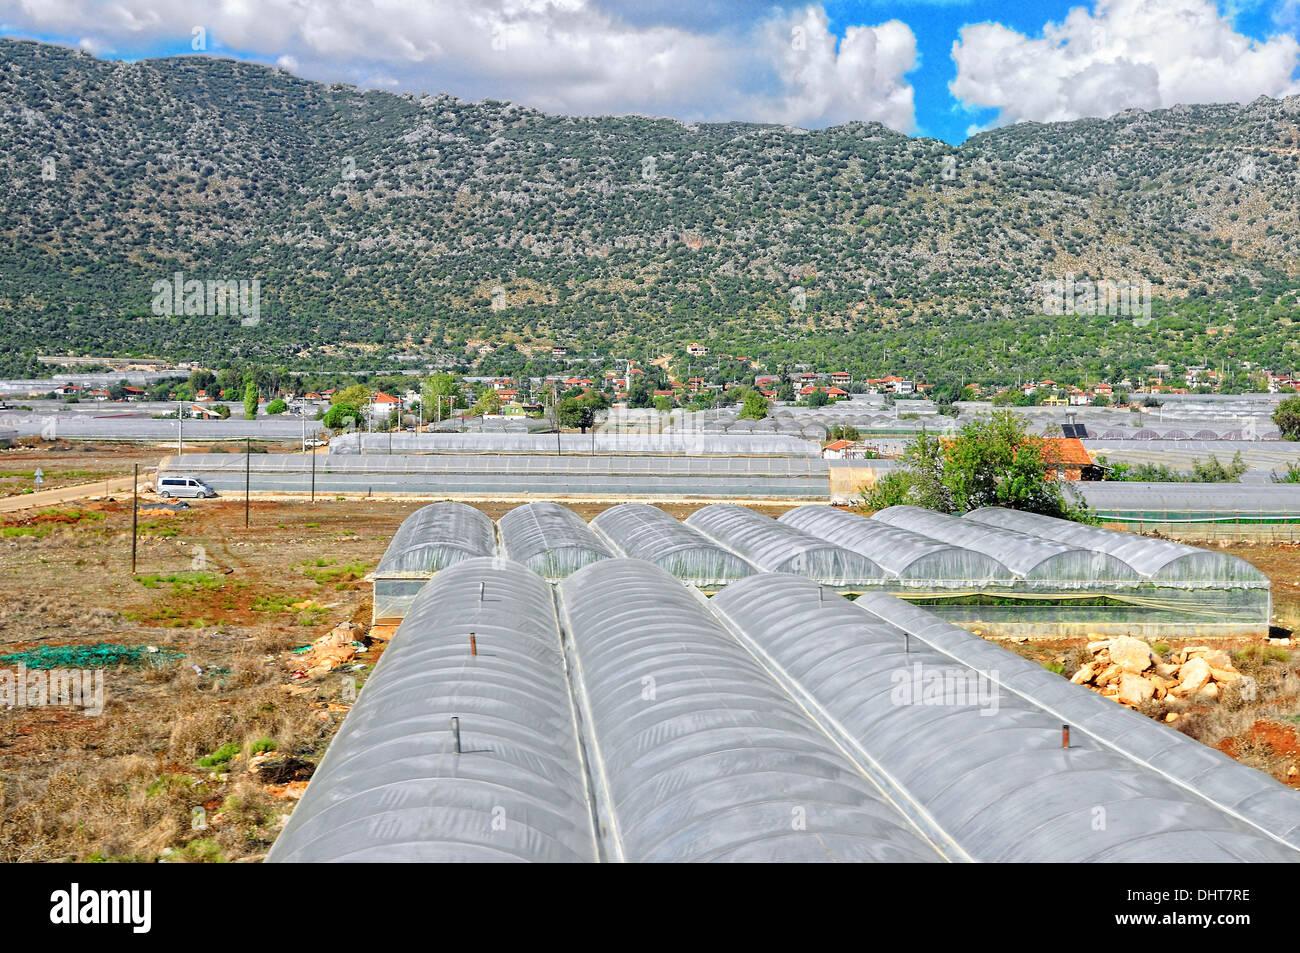 Greenhouses Turkey - Stock Image